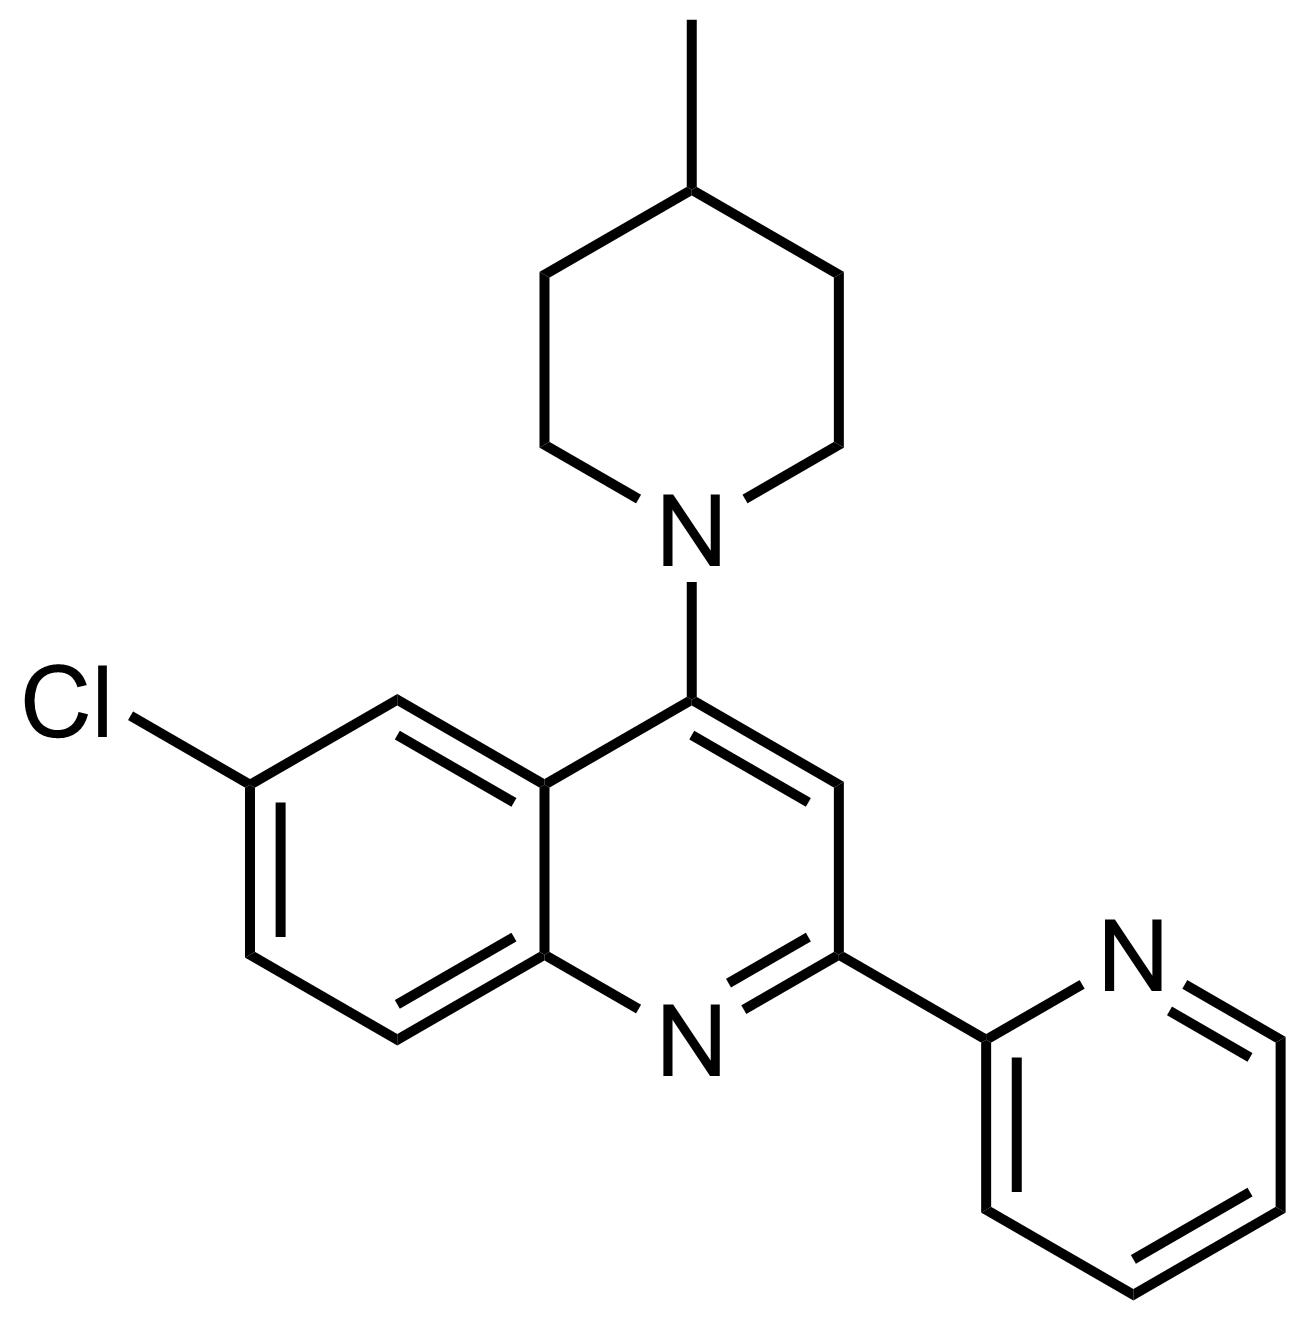 Structure of 6-Chloro-4-(4-methylpiperidin-1-yl)-2-(pyridin-2-yl)quinoline